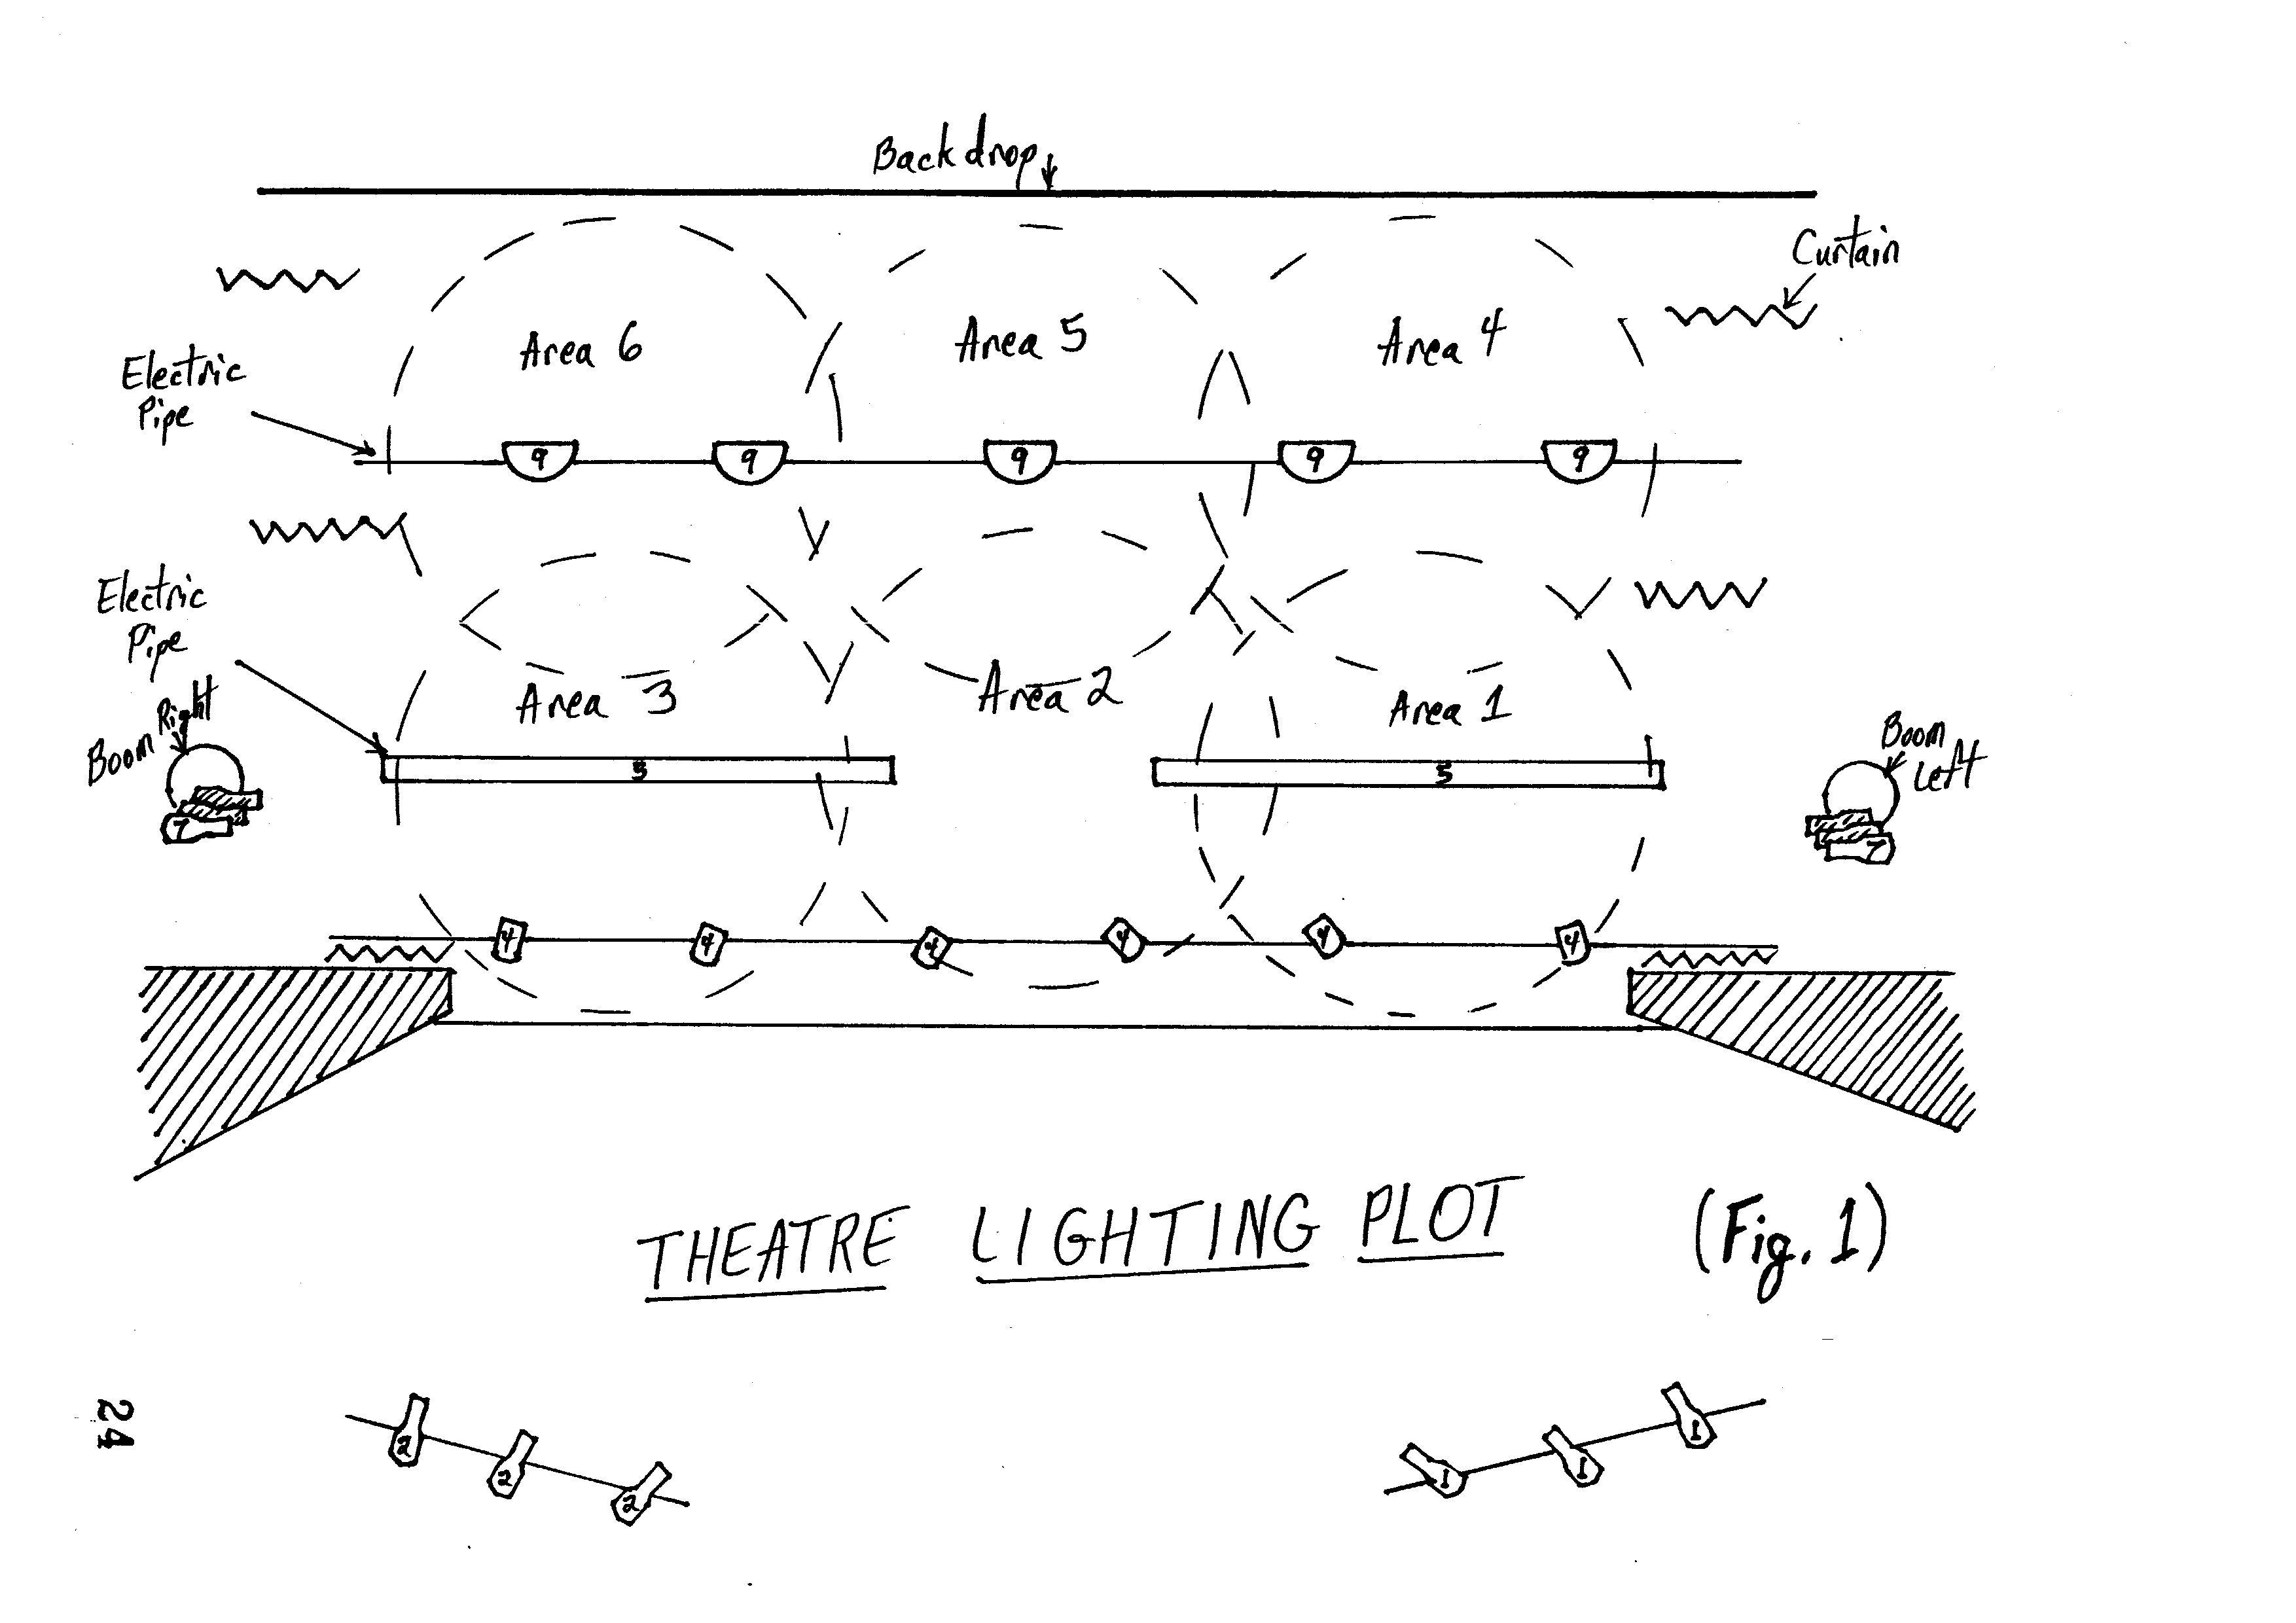 medium resolution of theatre light plot small venue